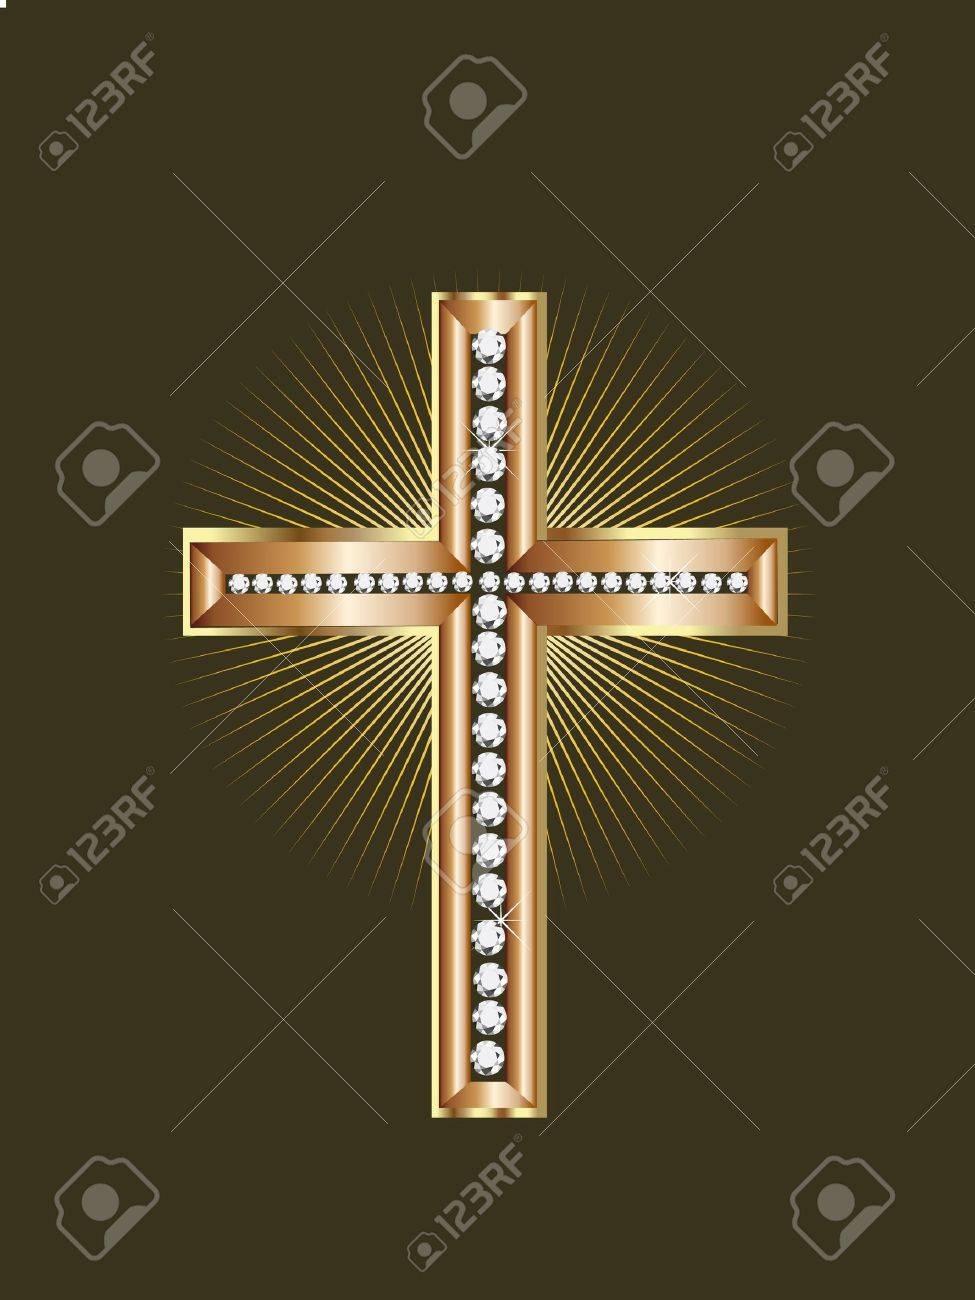 Gold Jewelry Cross Stock Vector - 10346174